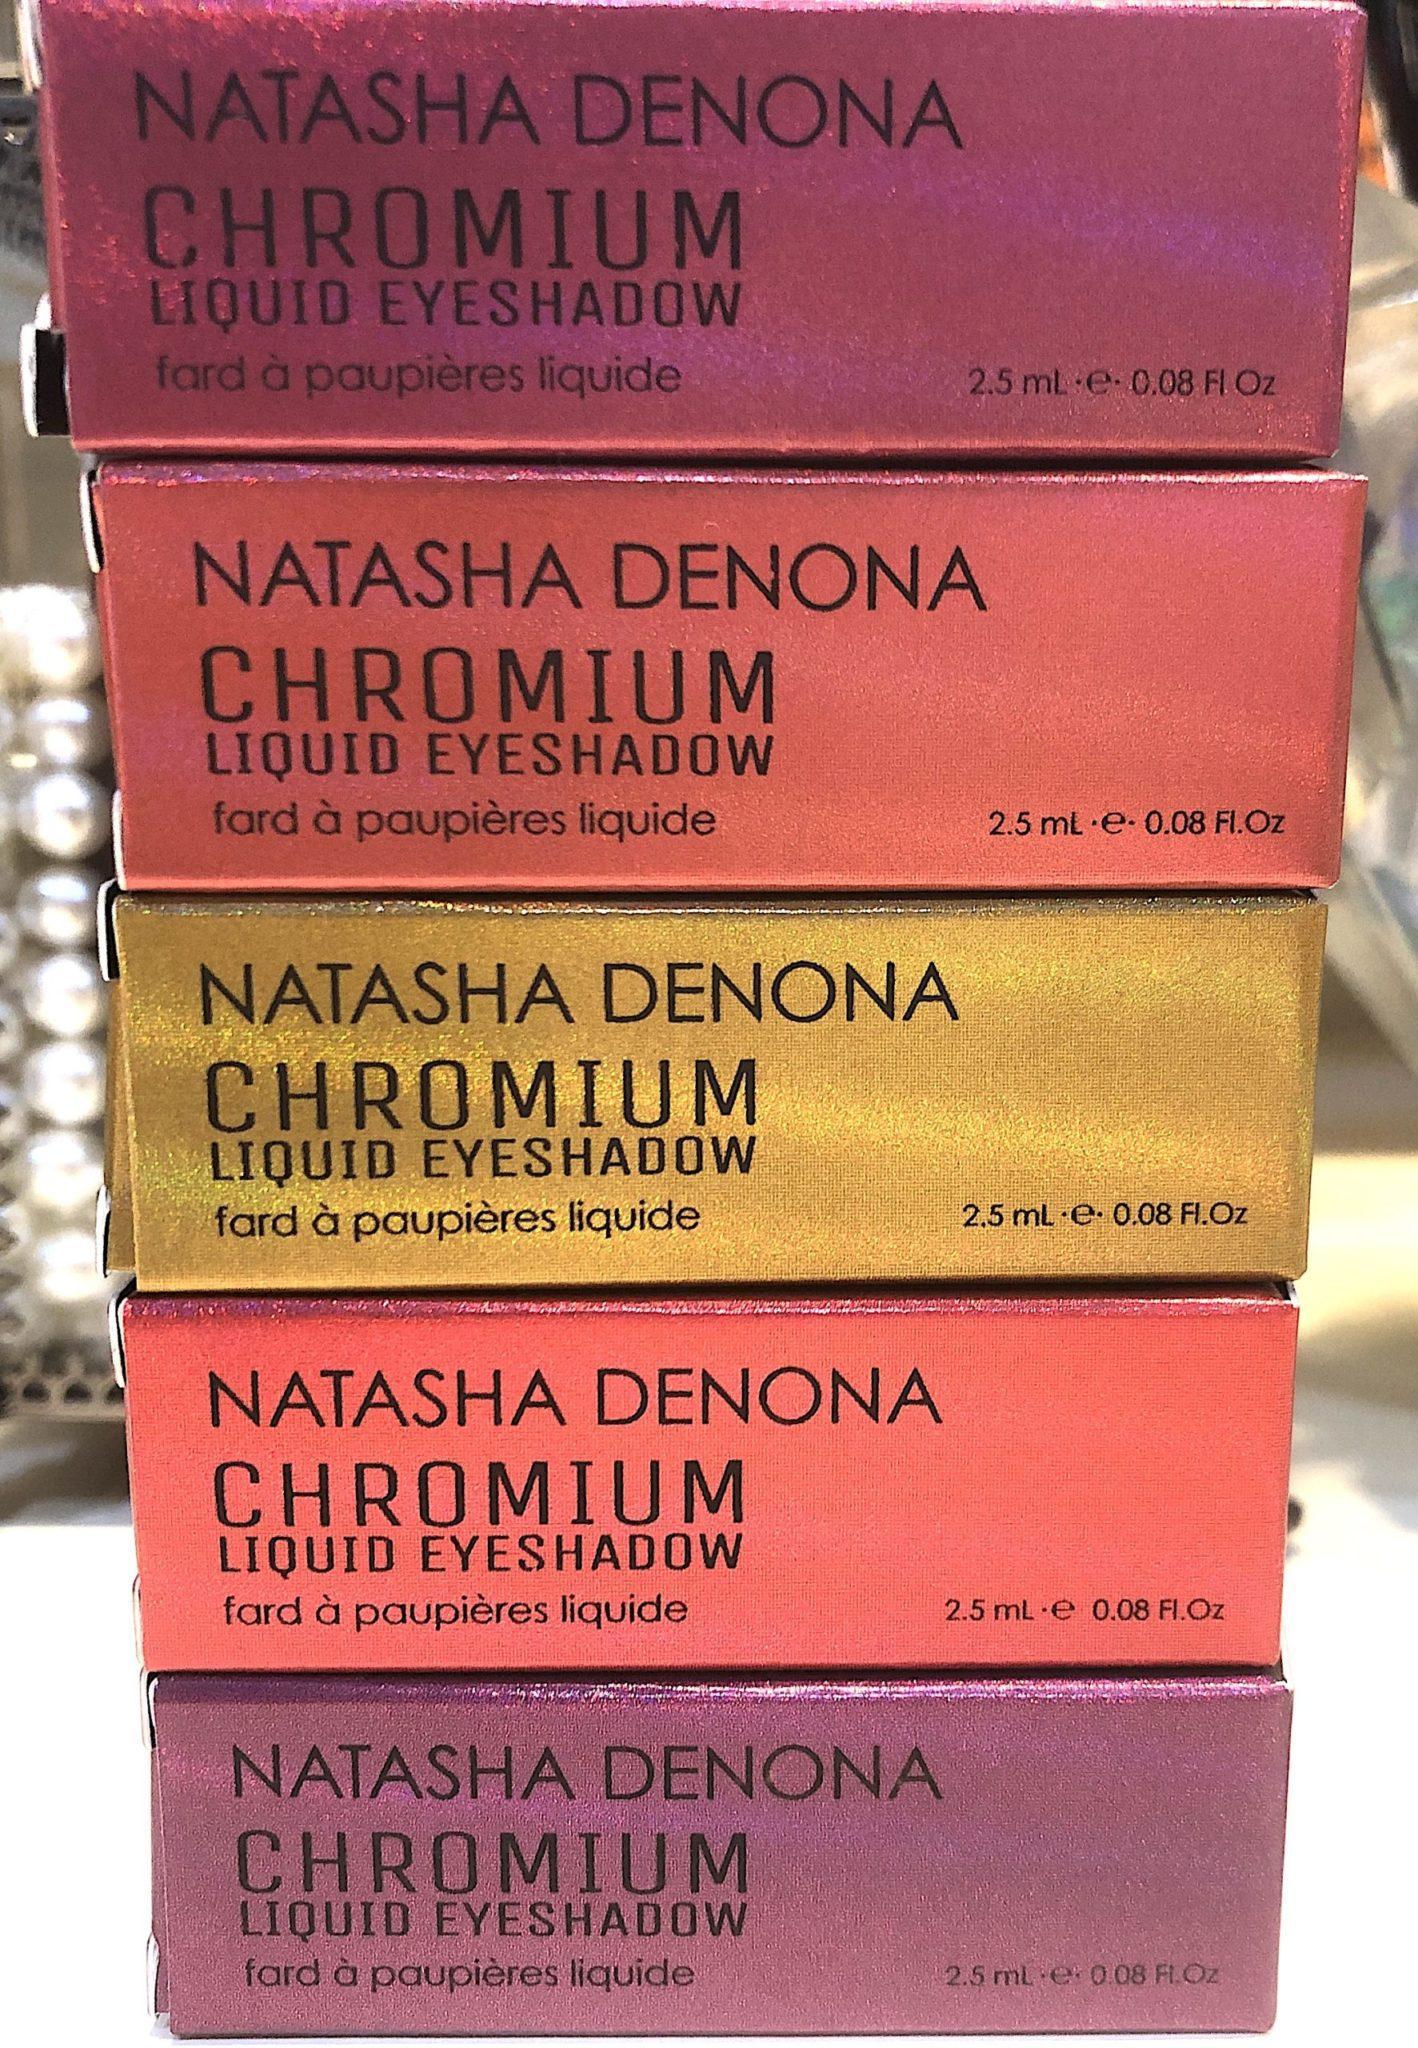 Natasha Denona Chromium Multichrome Liquid Shadow Packaging